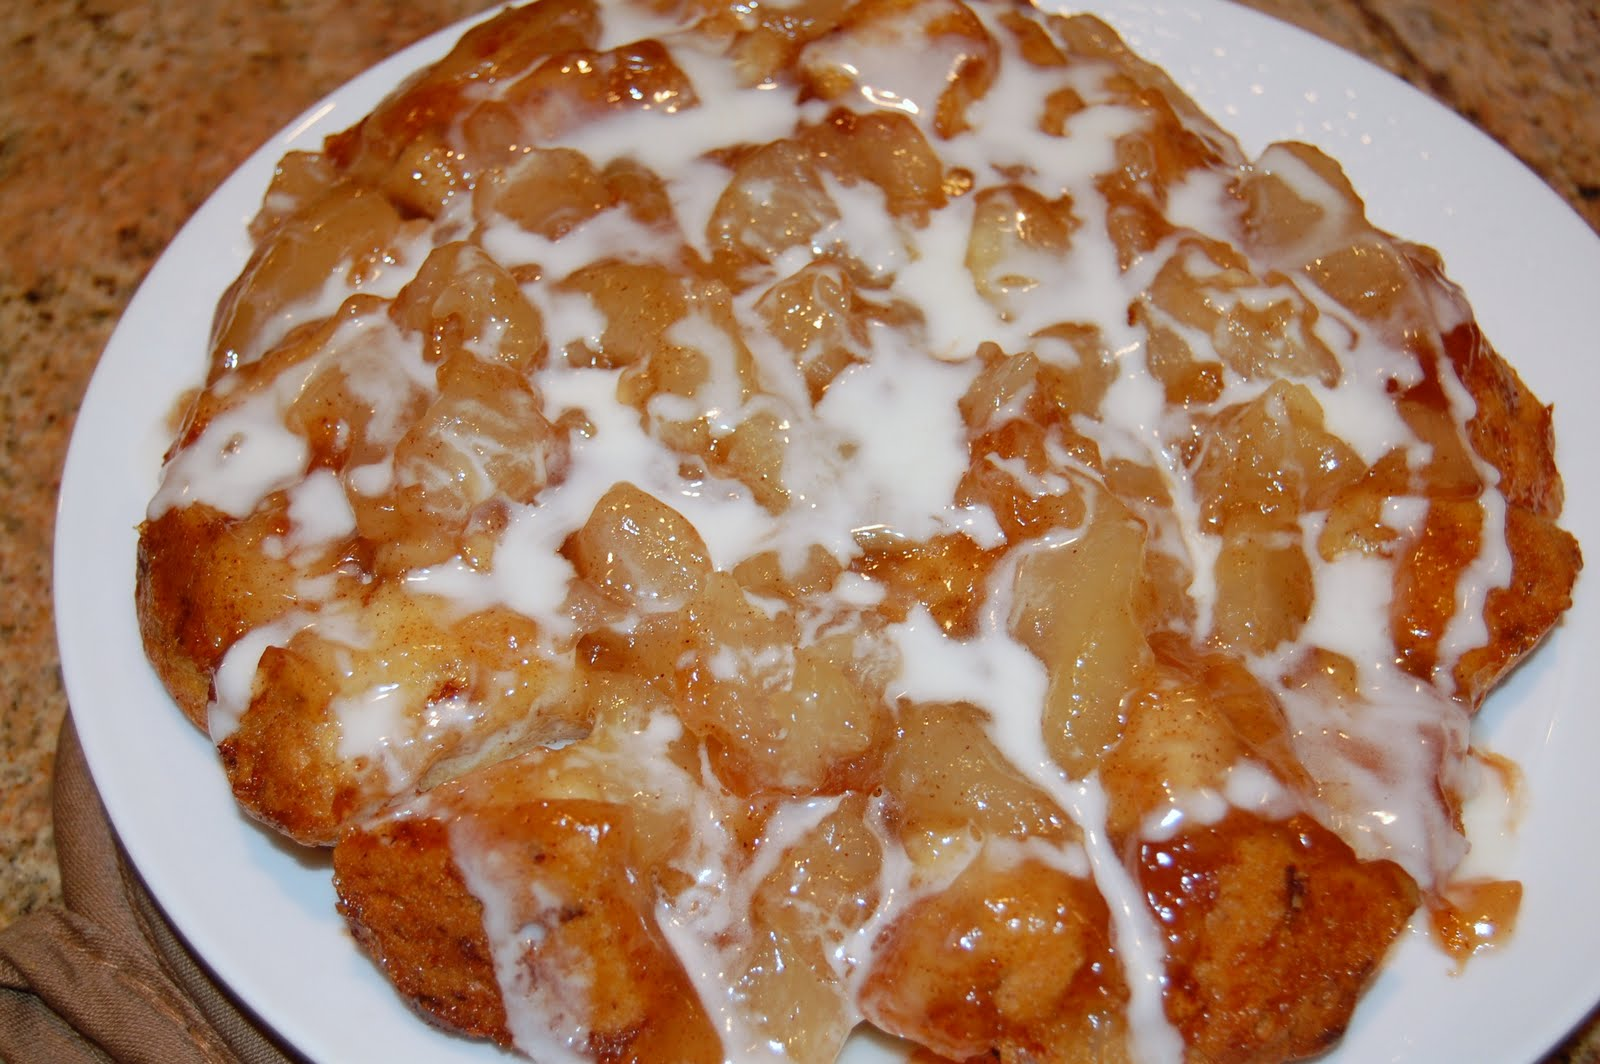 Meals at the Muirs: Upside Down Cinnamon Apple Coffee Cake